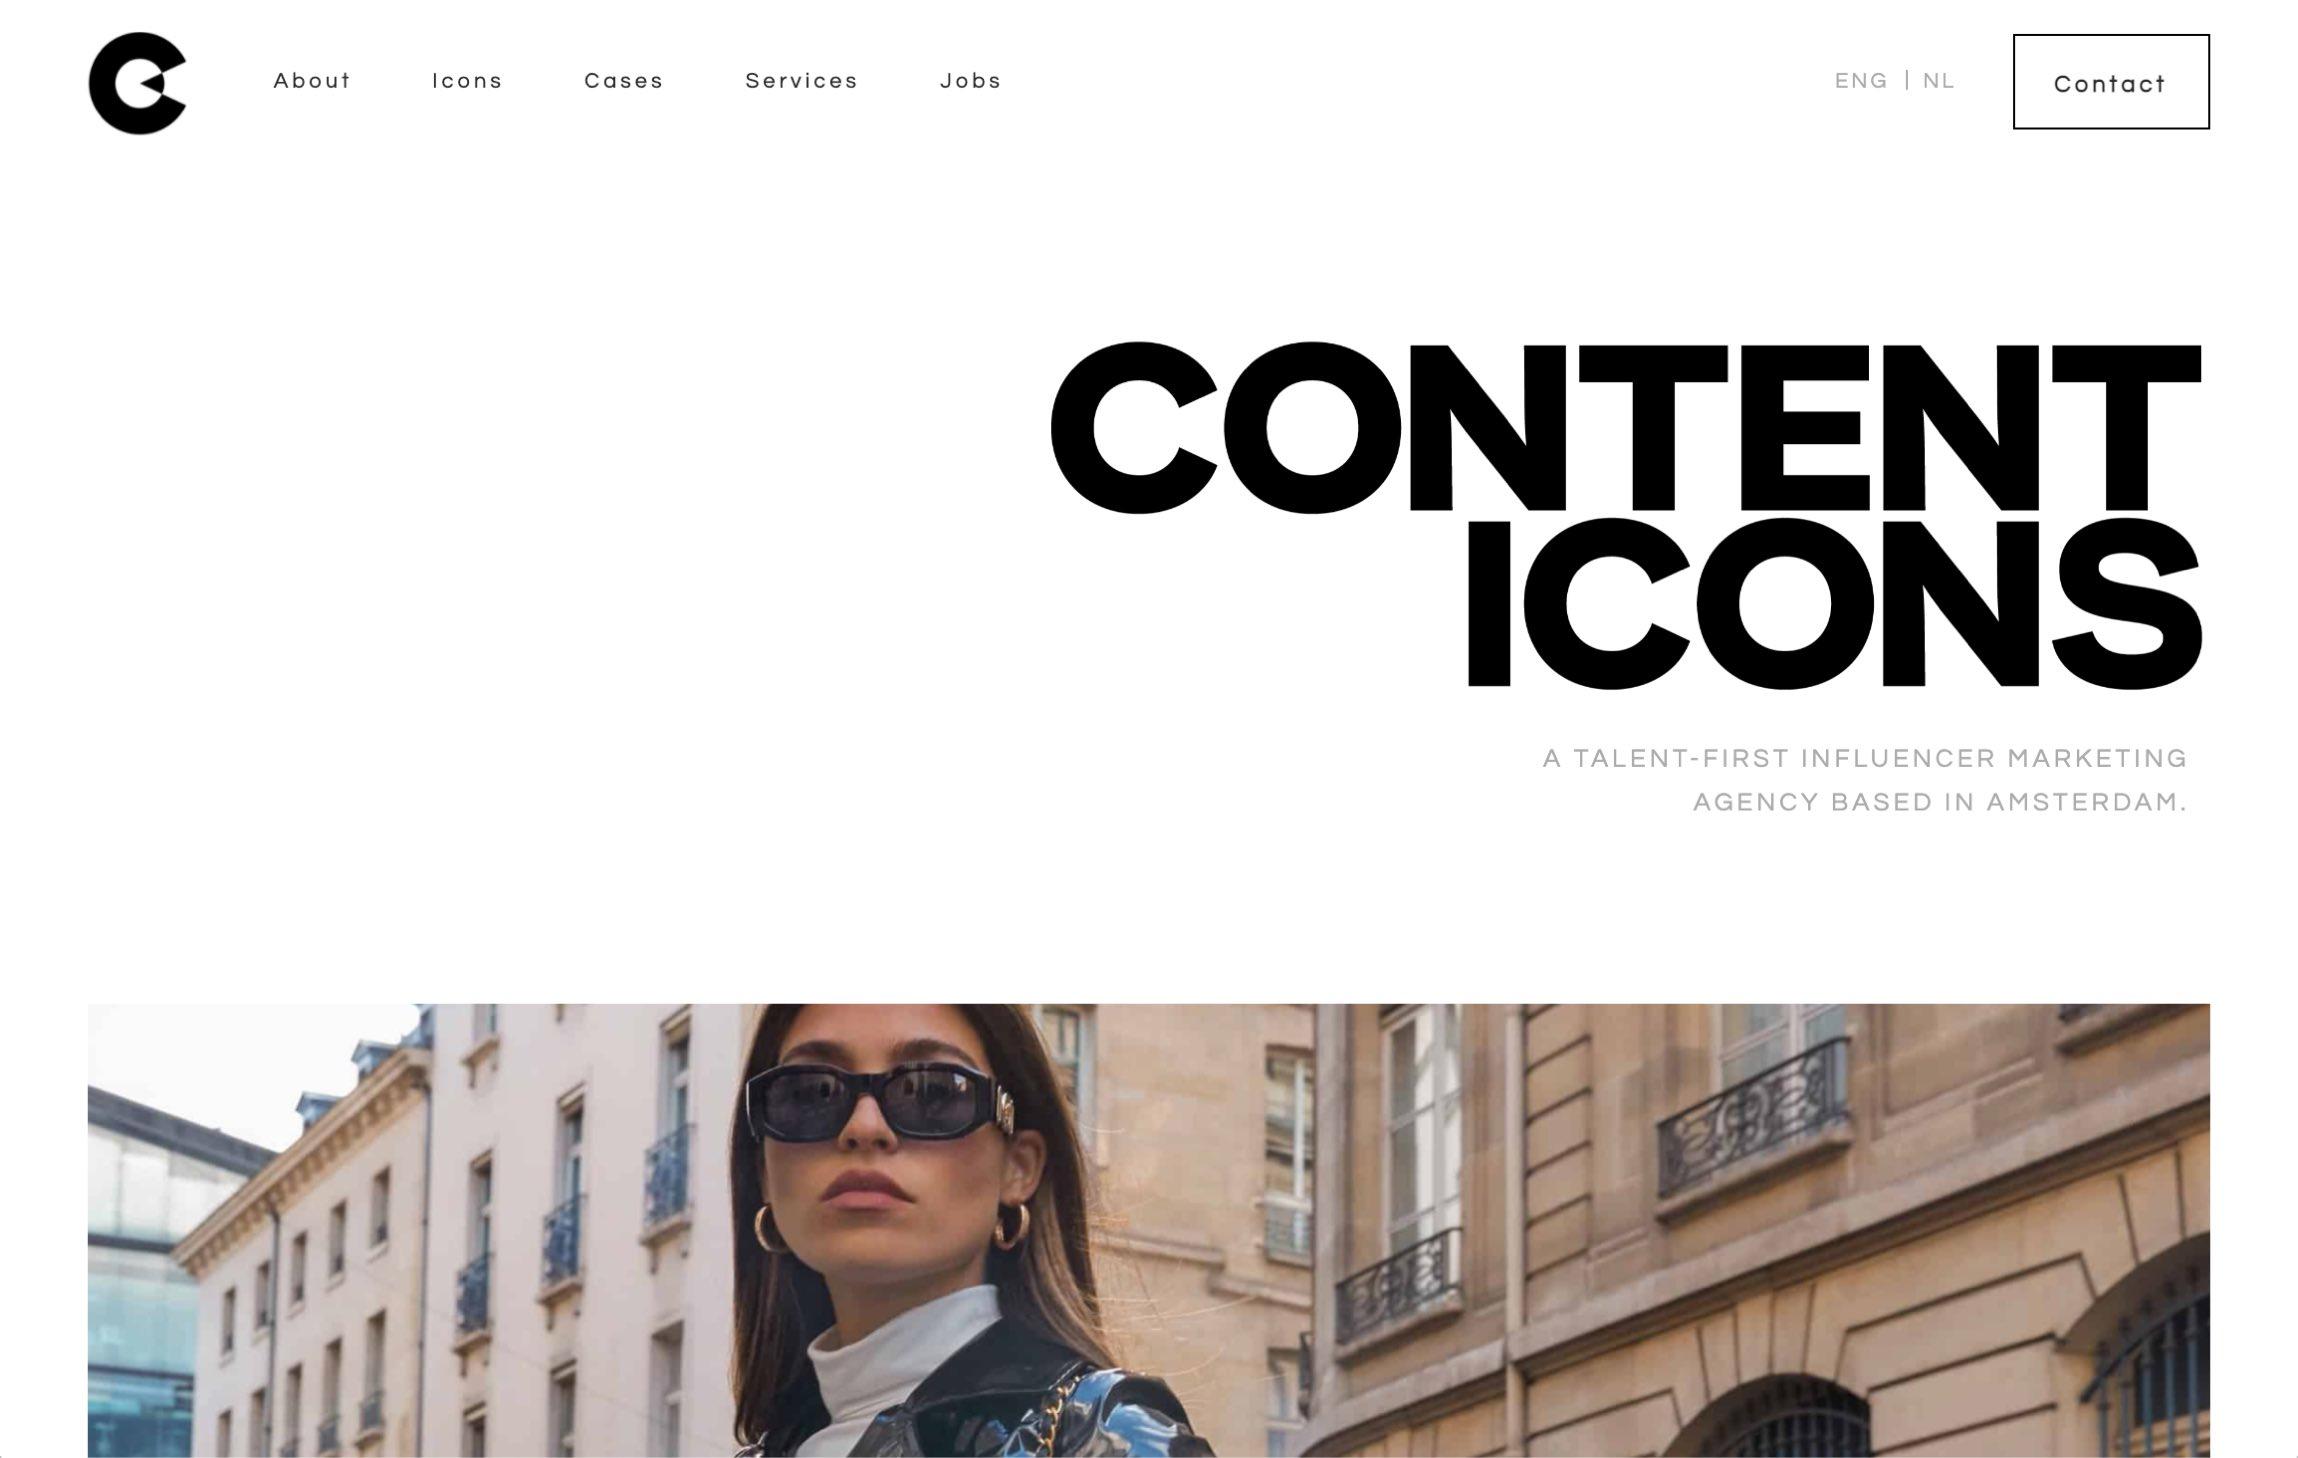 Tnwntytwo | Conenticons